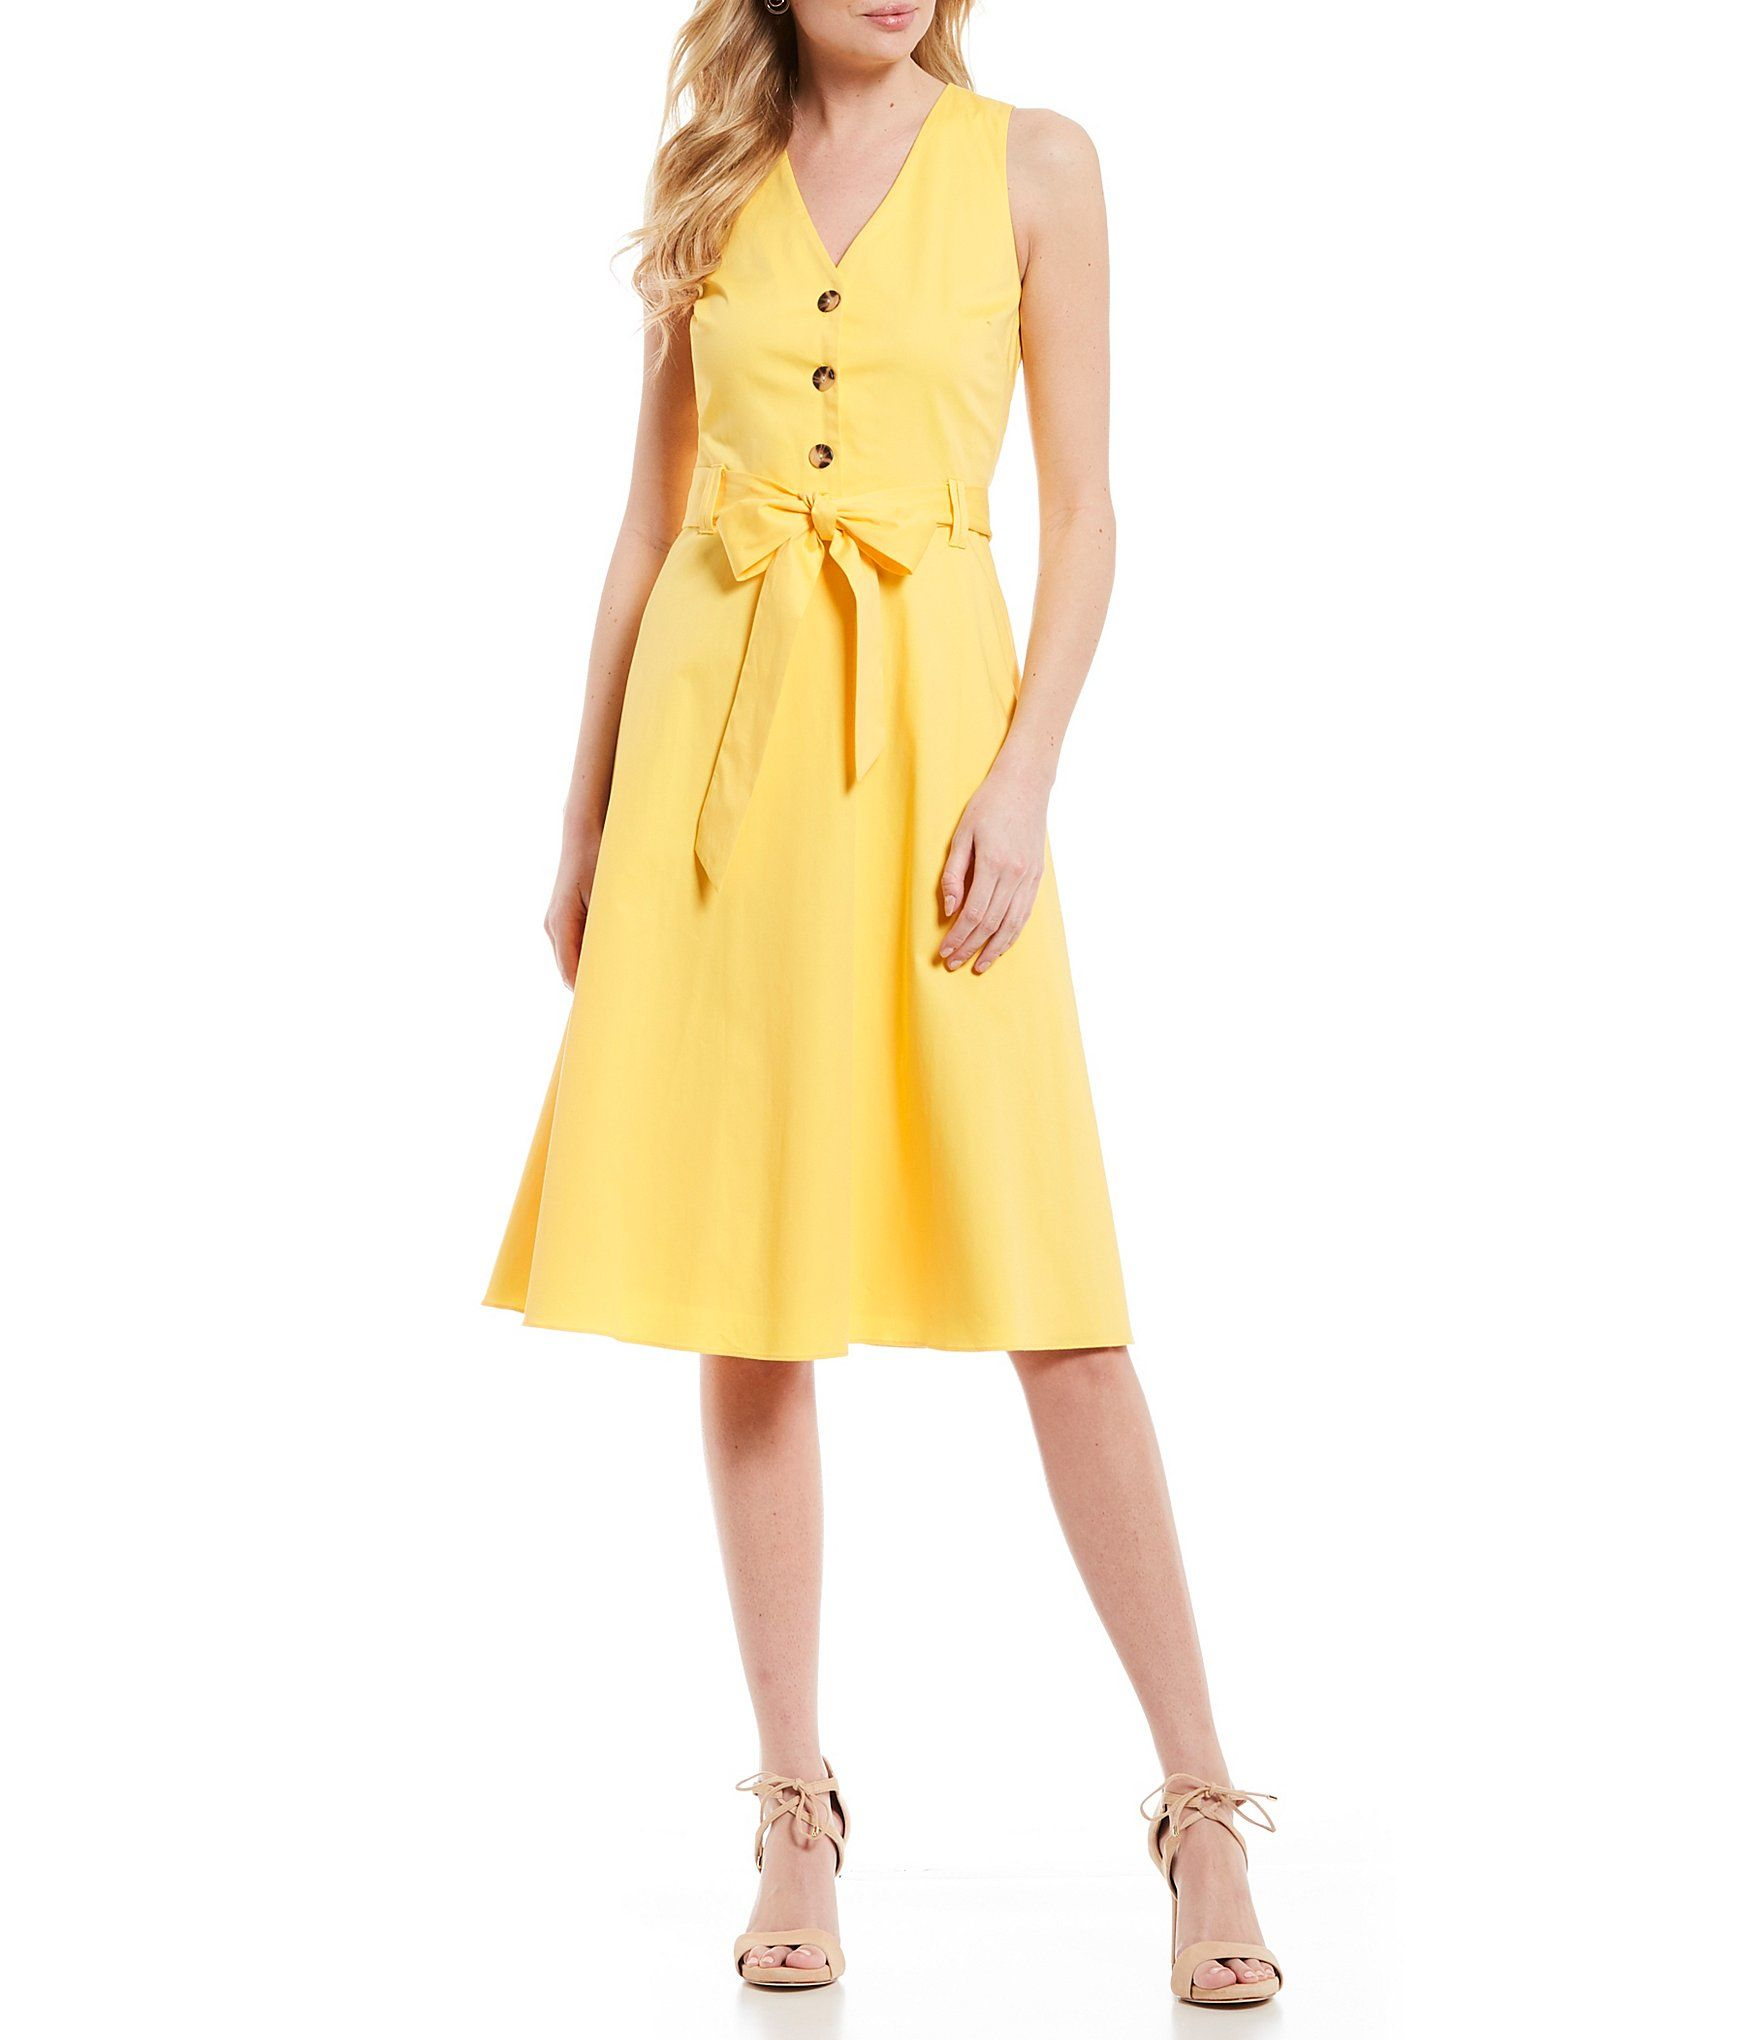 d34e8338b9d Antonio Melani Jenna Sateen Bow Belt A-Line Midi Dress  Dillards ...